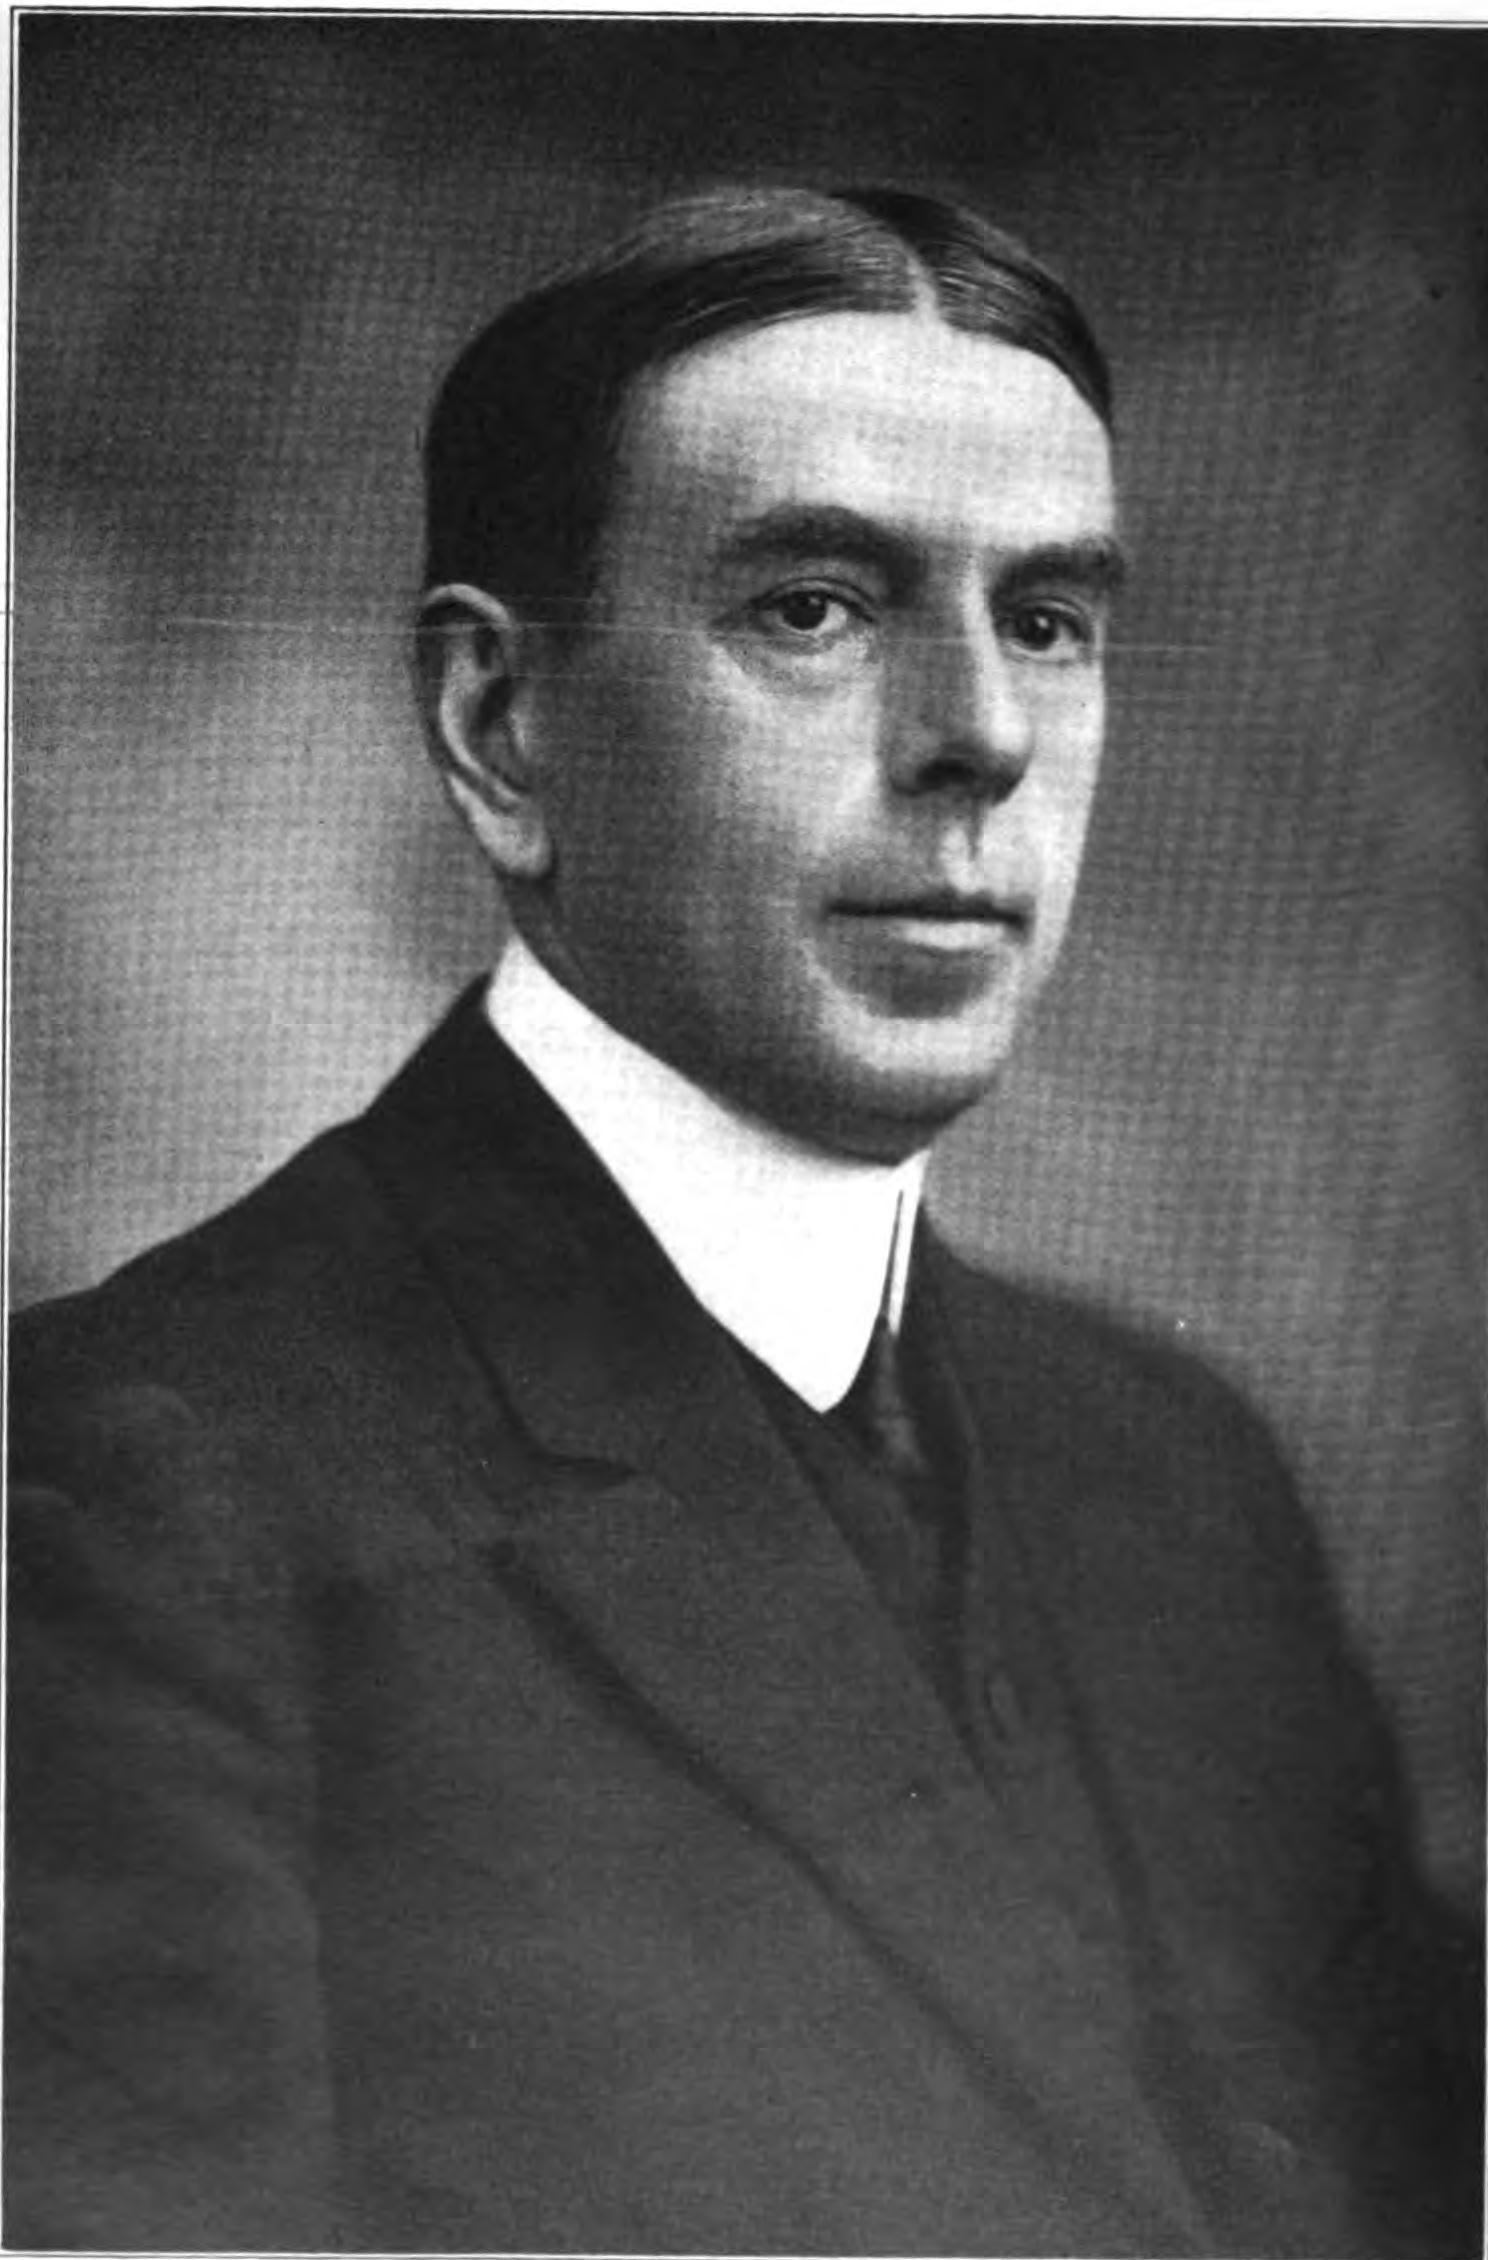 William Bayard Hale in 1914